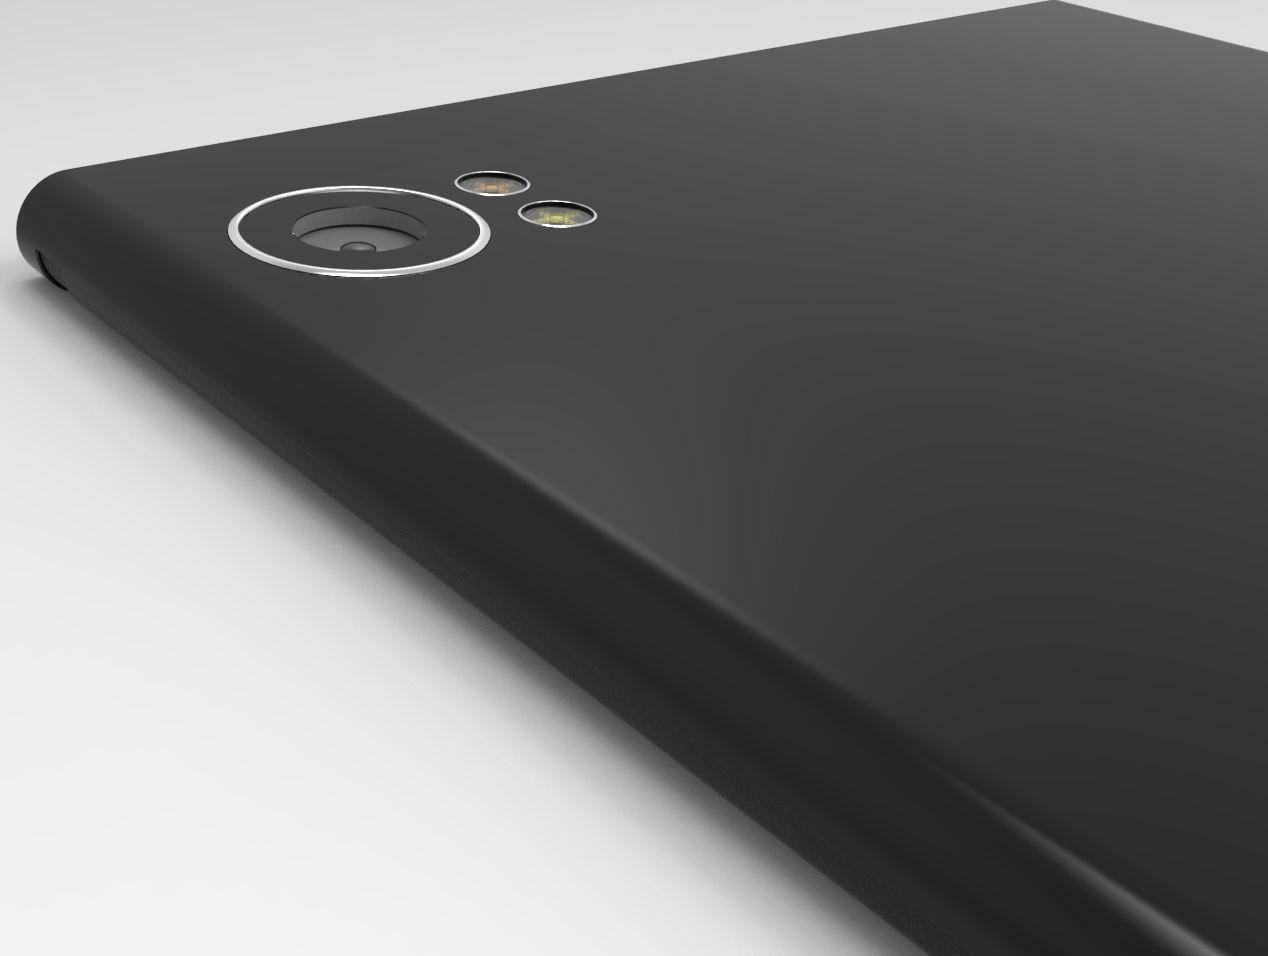 Sony Xperia Curve caméra